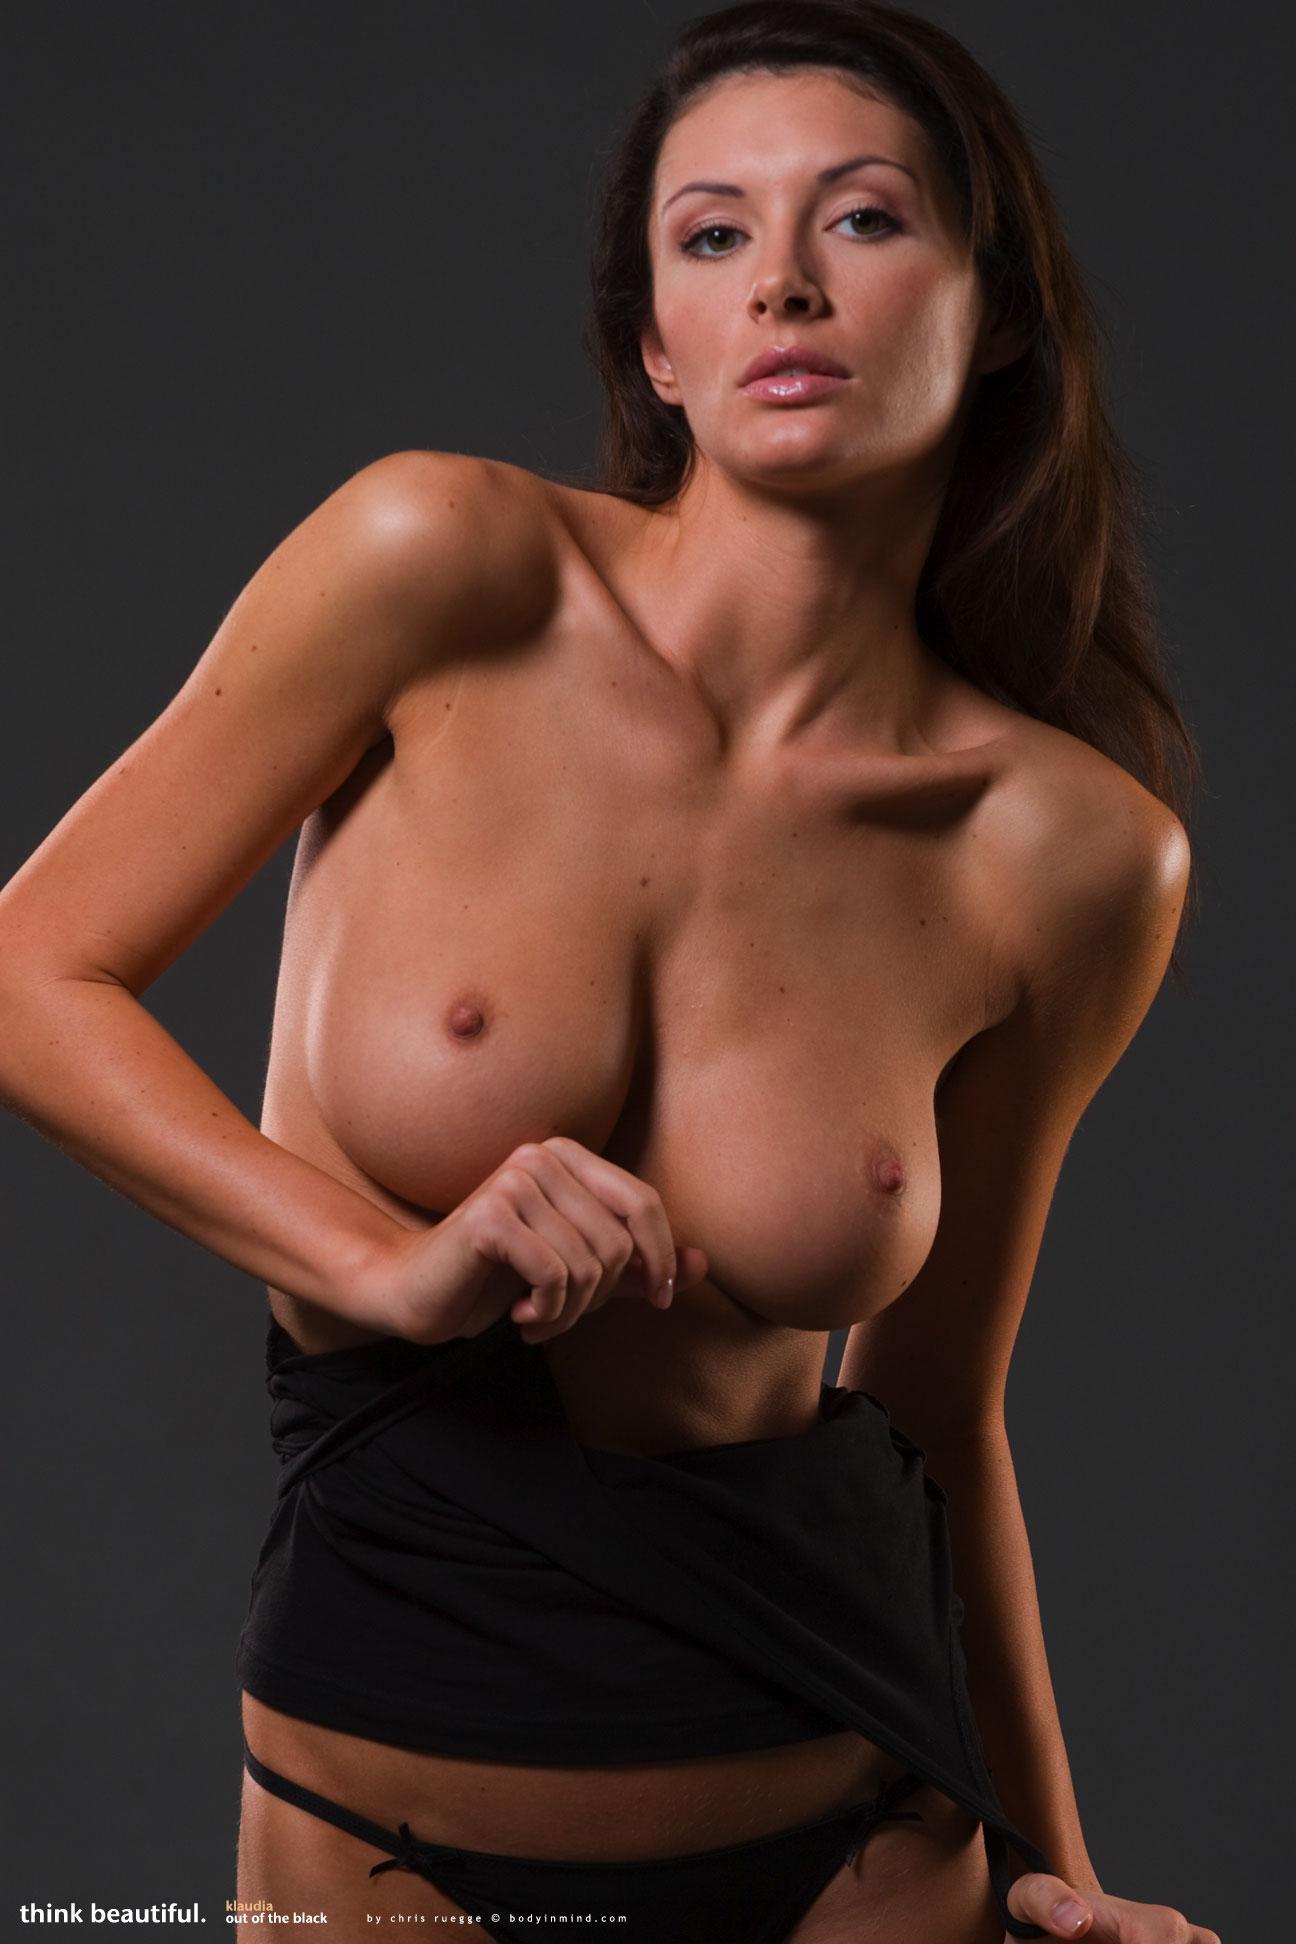 Klaudia Blackout - NudesPuri.com